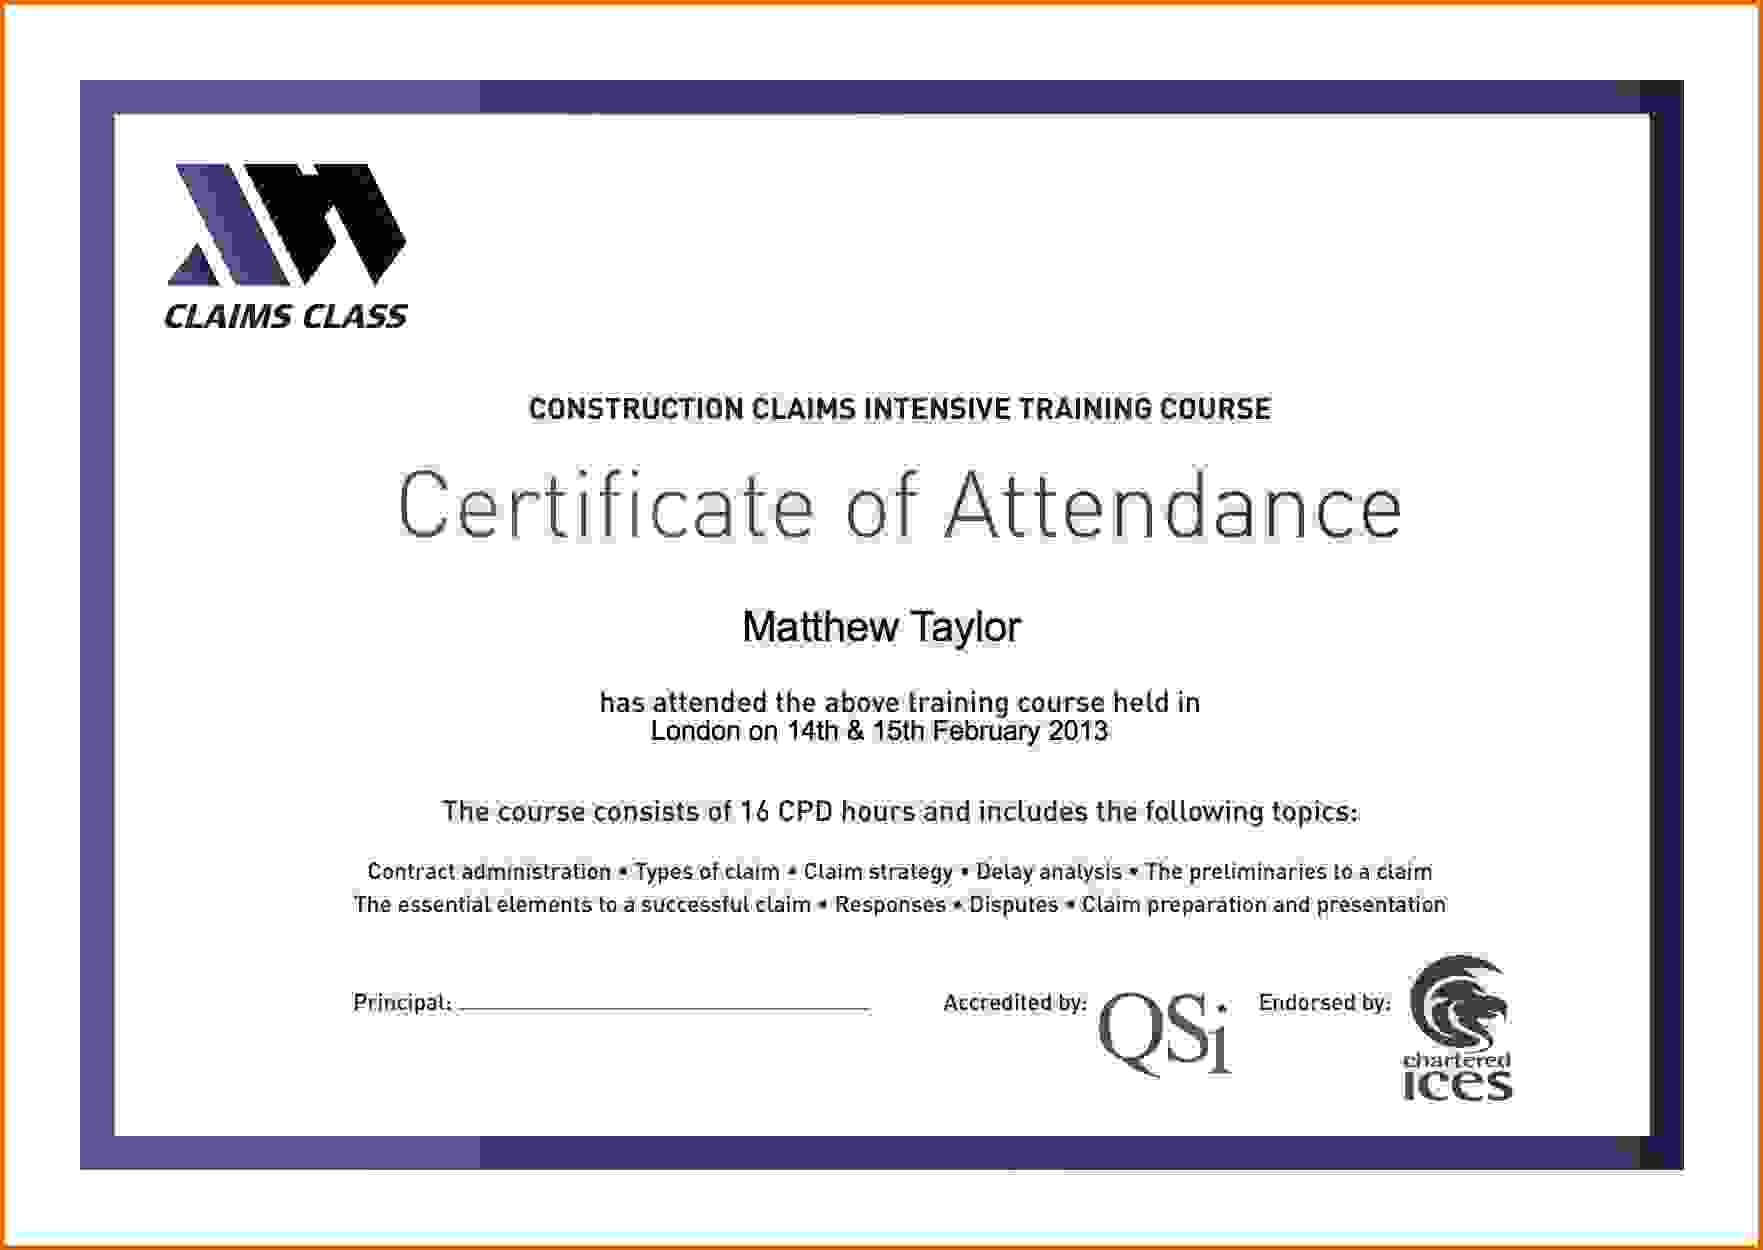 Certificate Attendance Templatec Certification Letter With Attendance Certificate Template Word